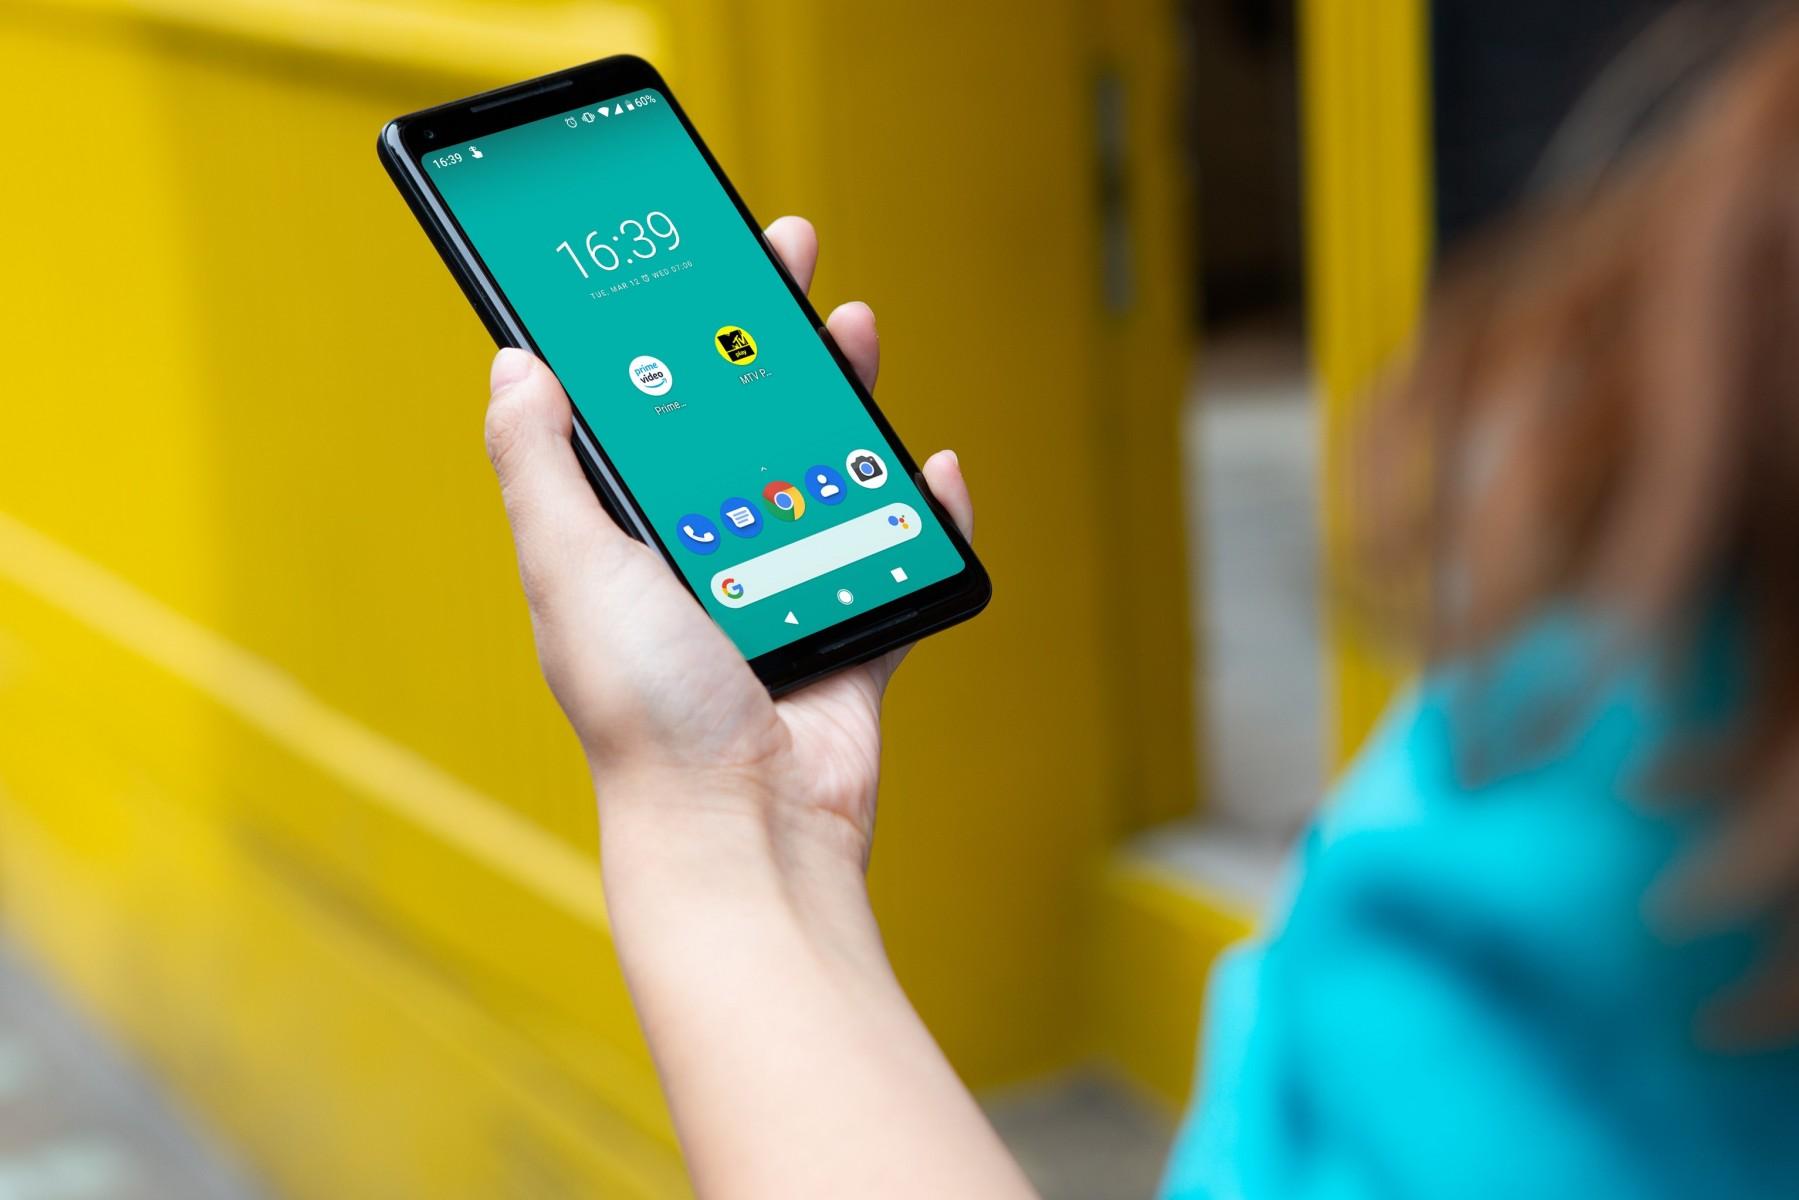 EE provides Amazon Prime Video with inclusive mobile data